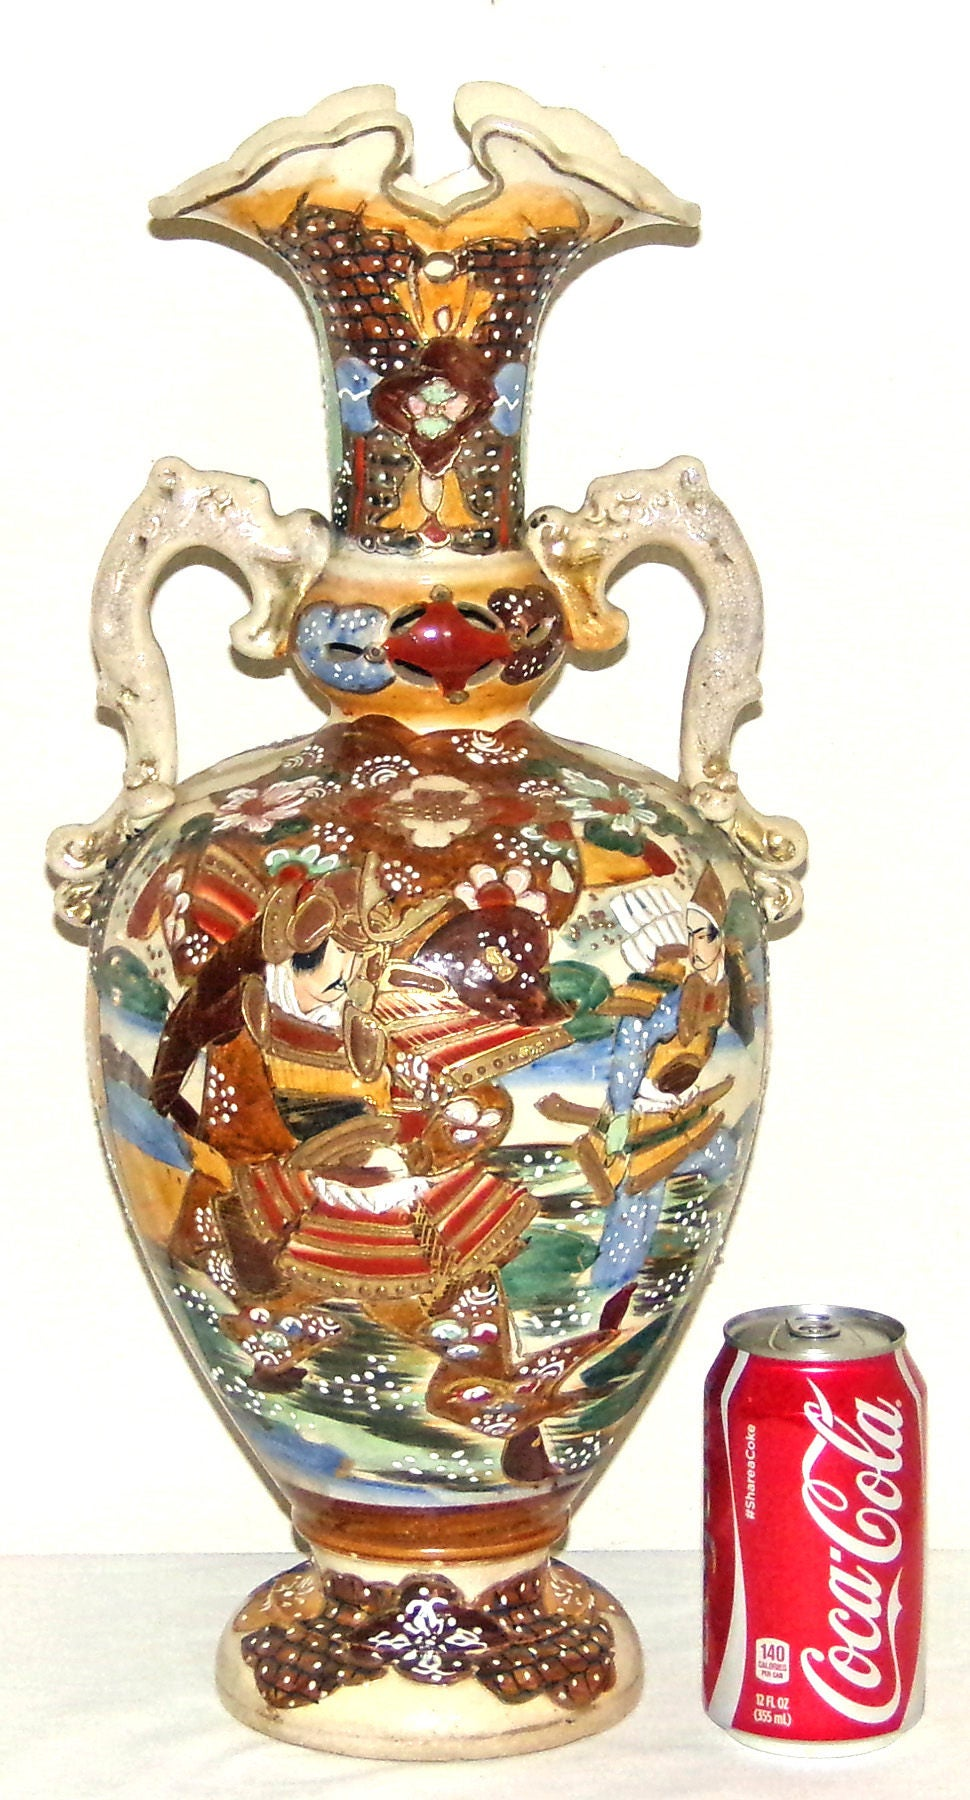 Large antique japanese satsuma samurai warrior urn vase c1910 large antique japanese satsuma samurai warrior urn vase c1910 meiji period urn vase vintage reviewsmspy